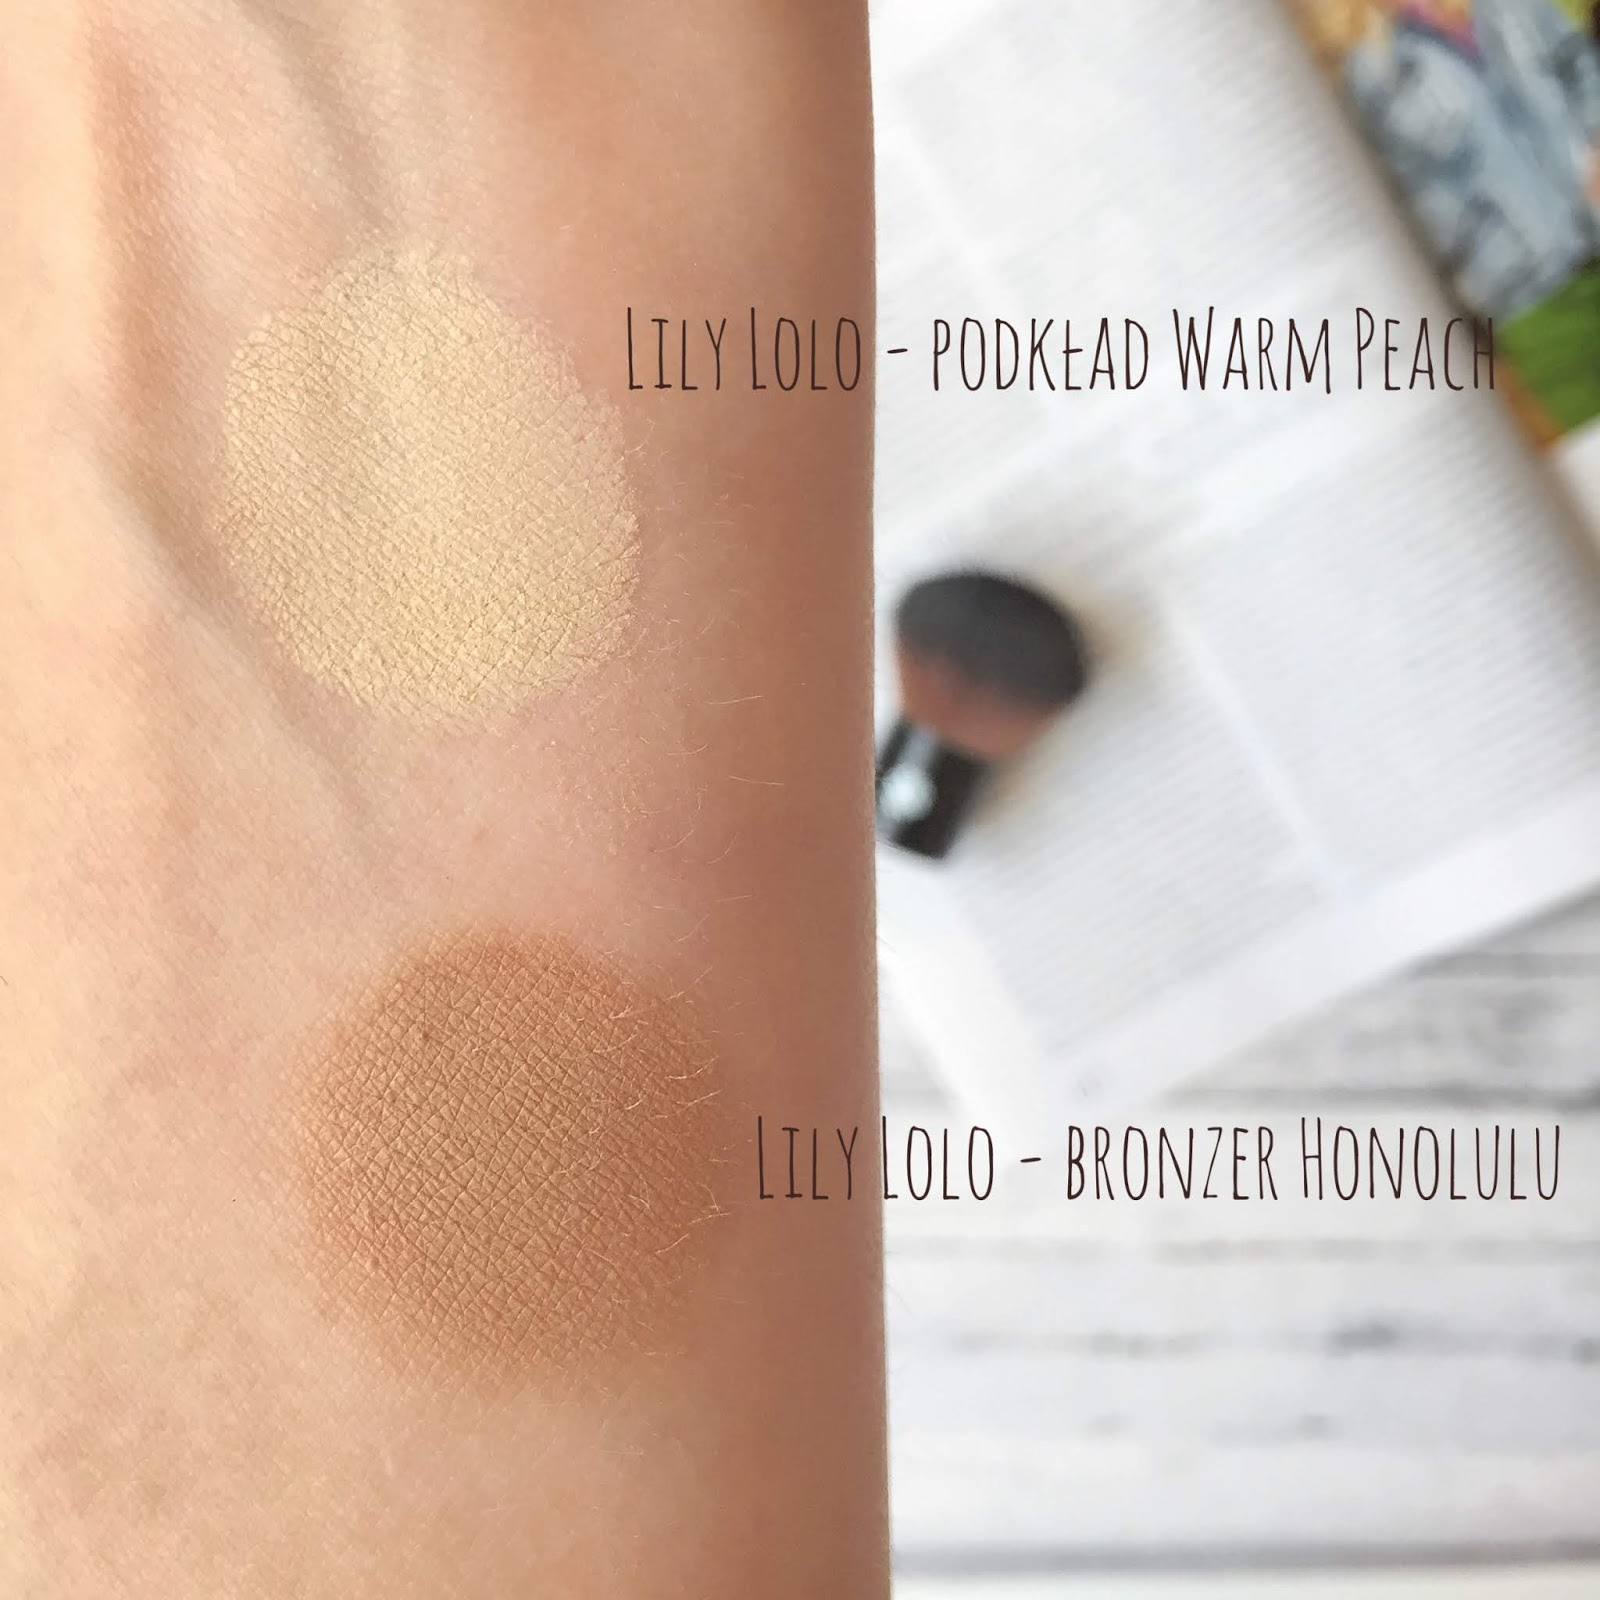 kosmetyki Lily Lolo